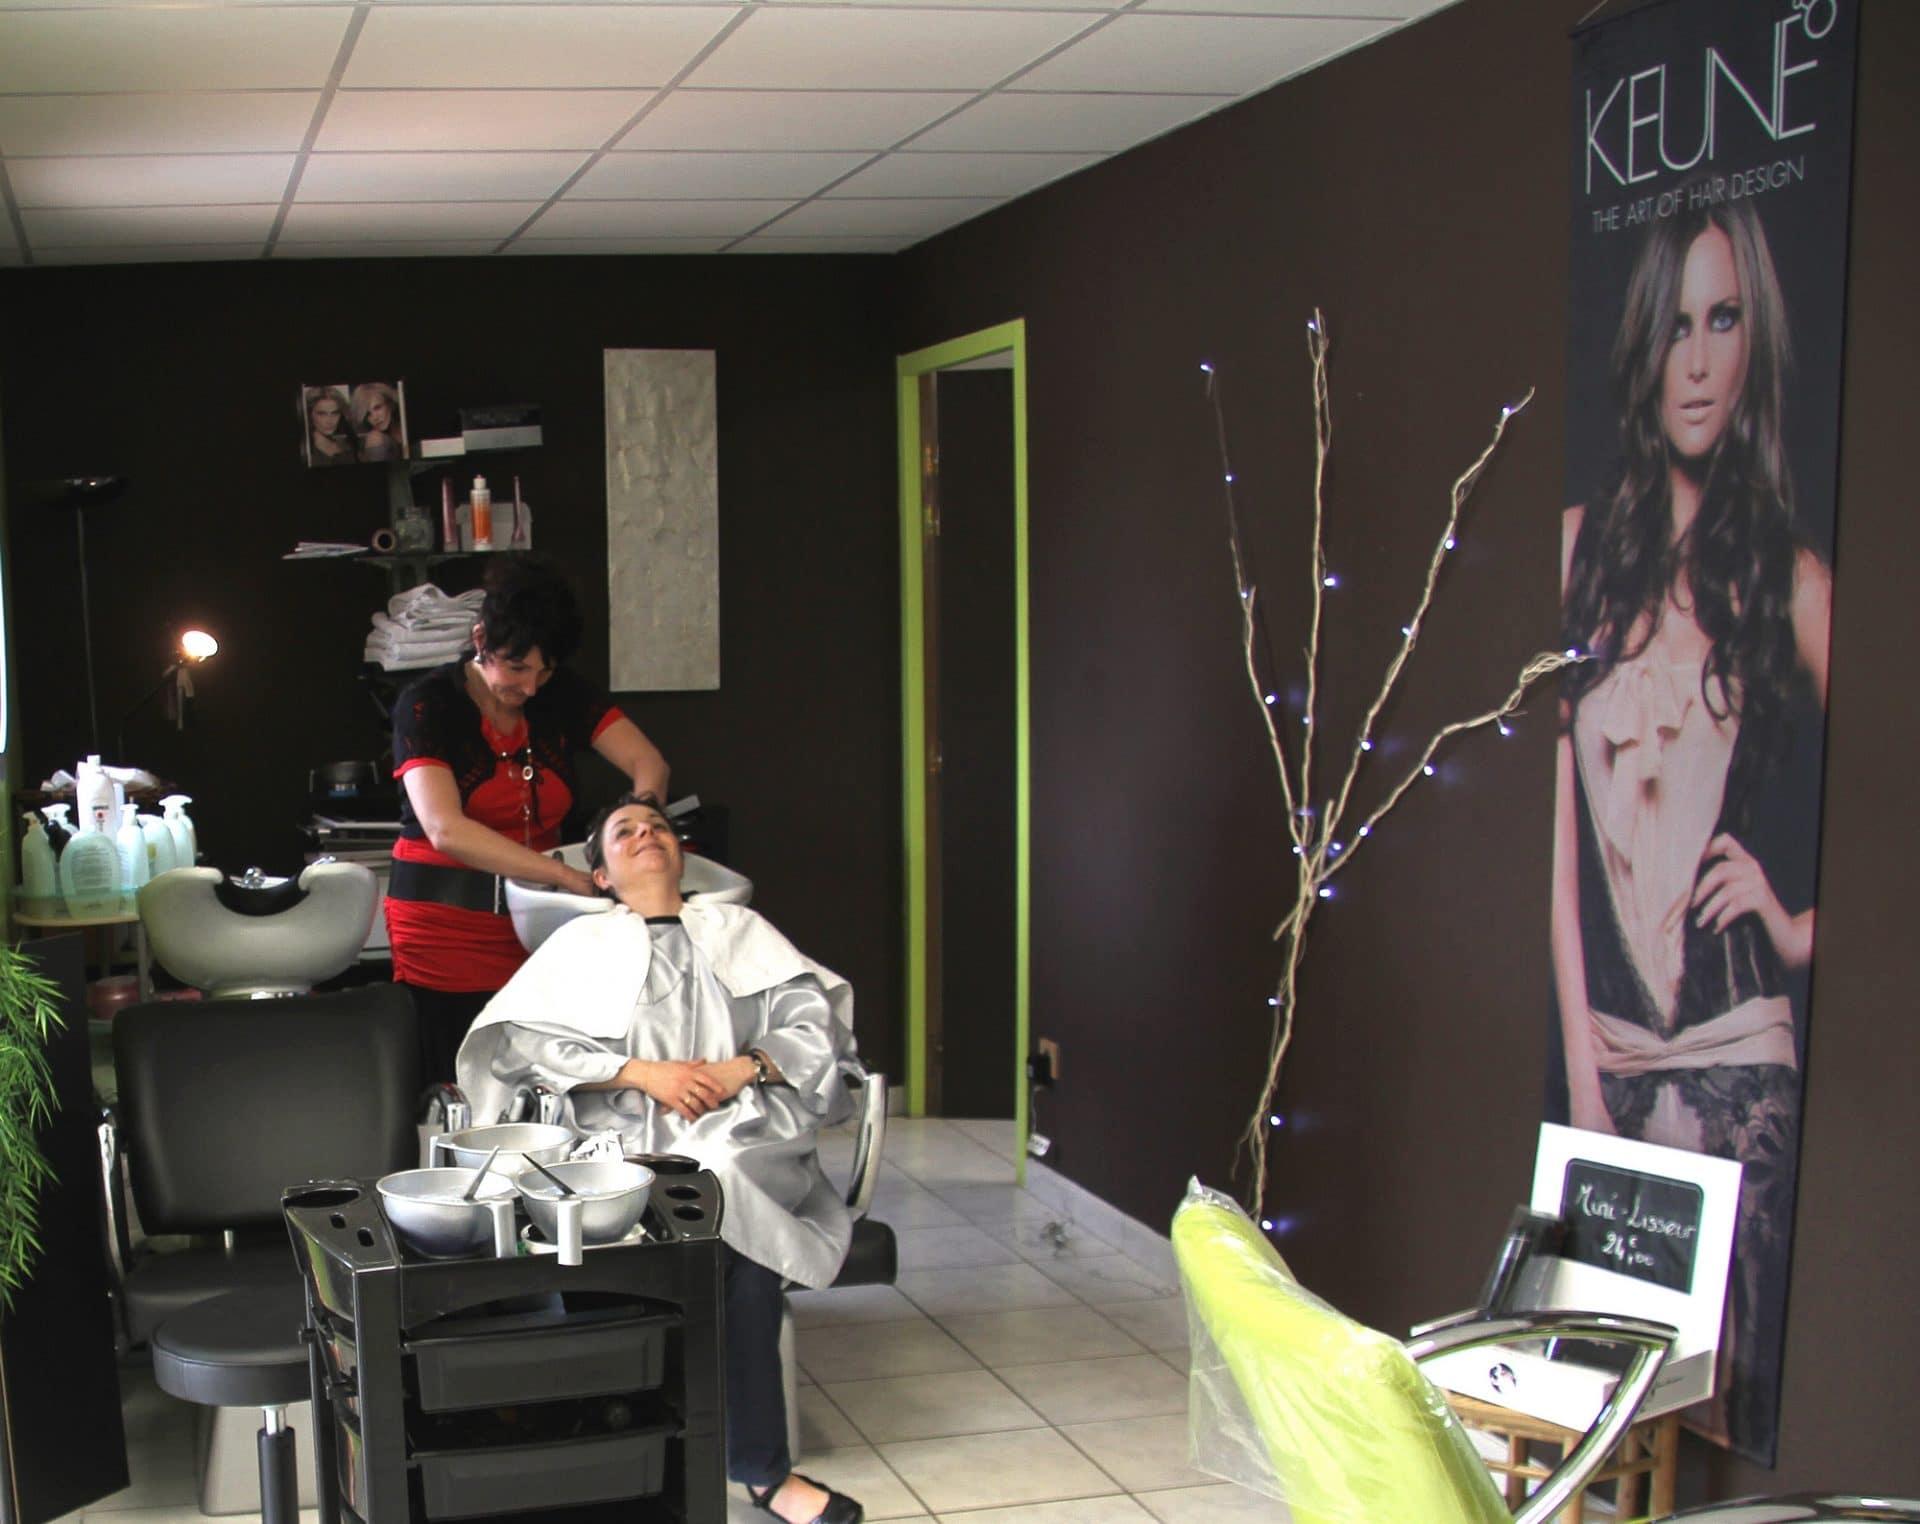 Salon de coiffure defiplanet for Salon de coiffure martigues